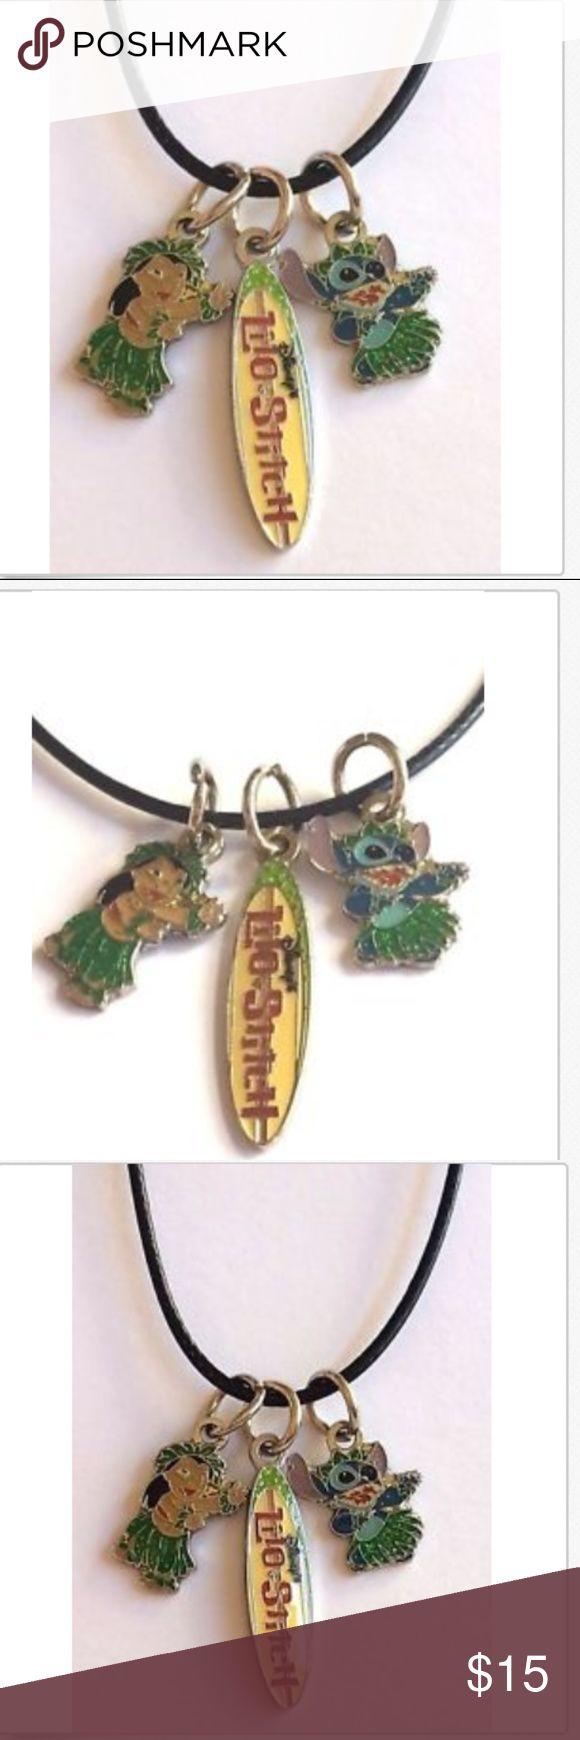 "Silver Lilo & Stitch Necklace Pendant Disney 19"" | Disney ..."